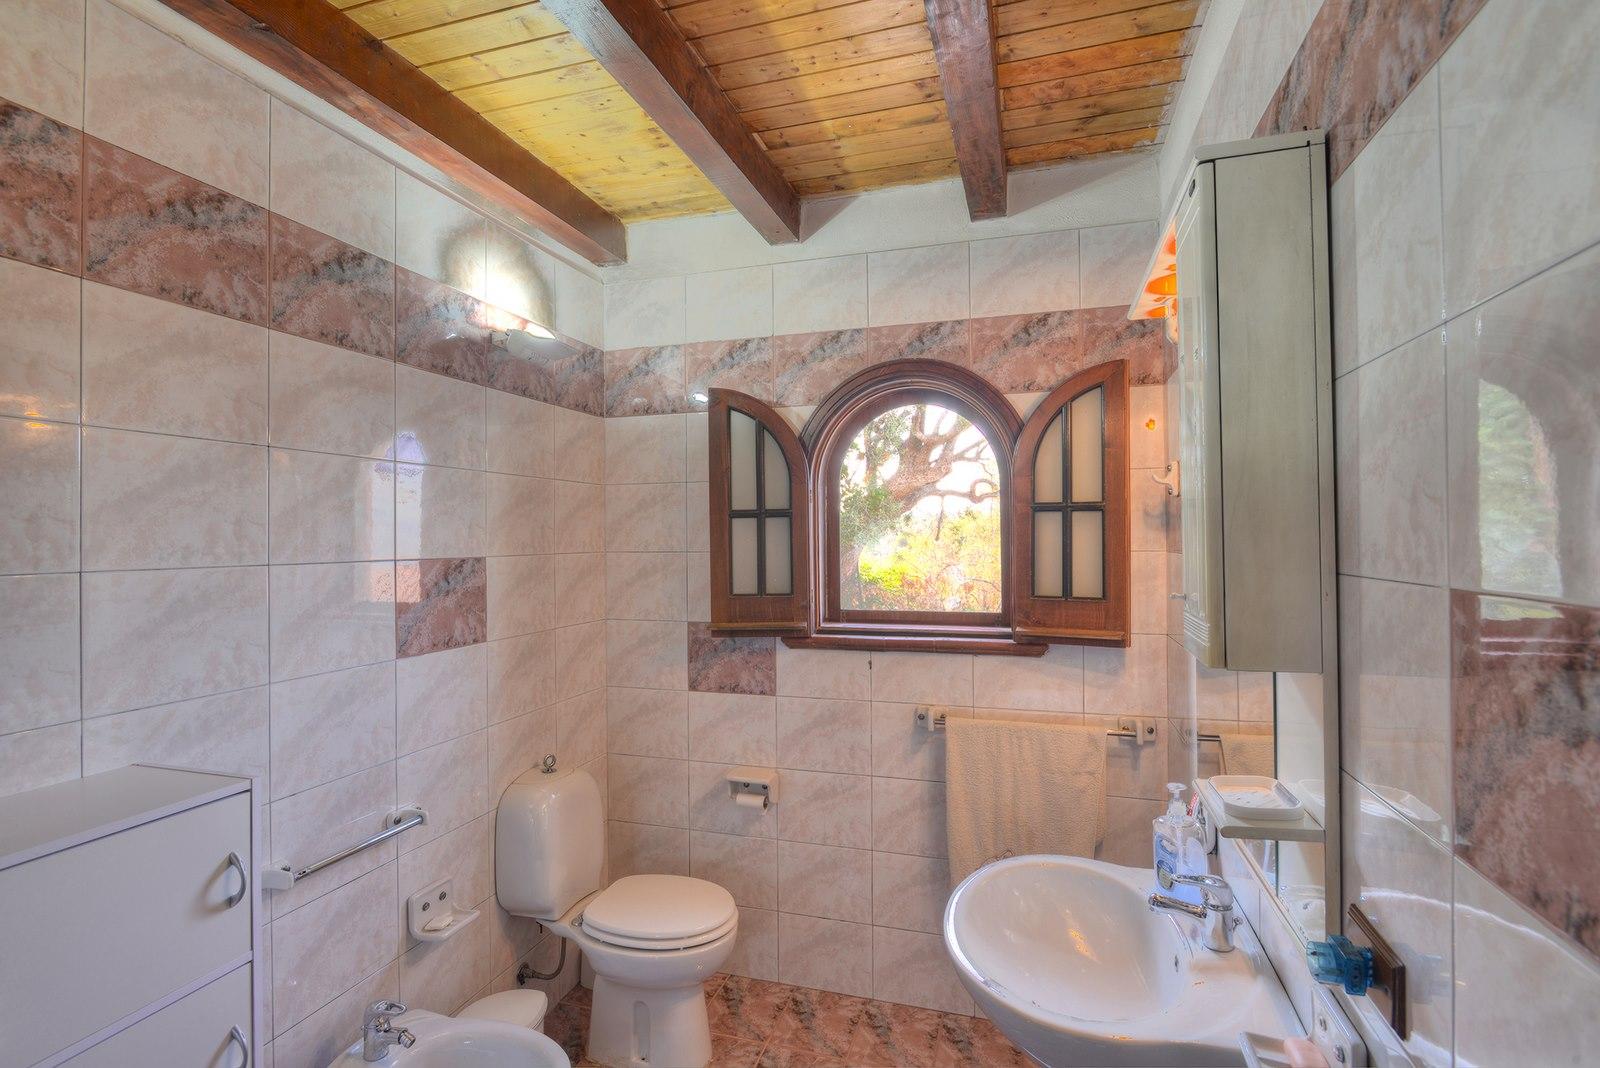 Maison de vacances Villa Casa (1531407), Solarino, Siracusa, Sicile, Italie, image 14